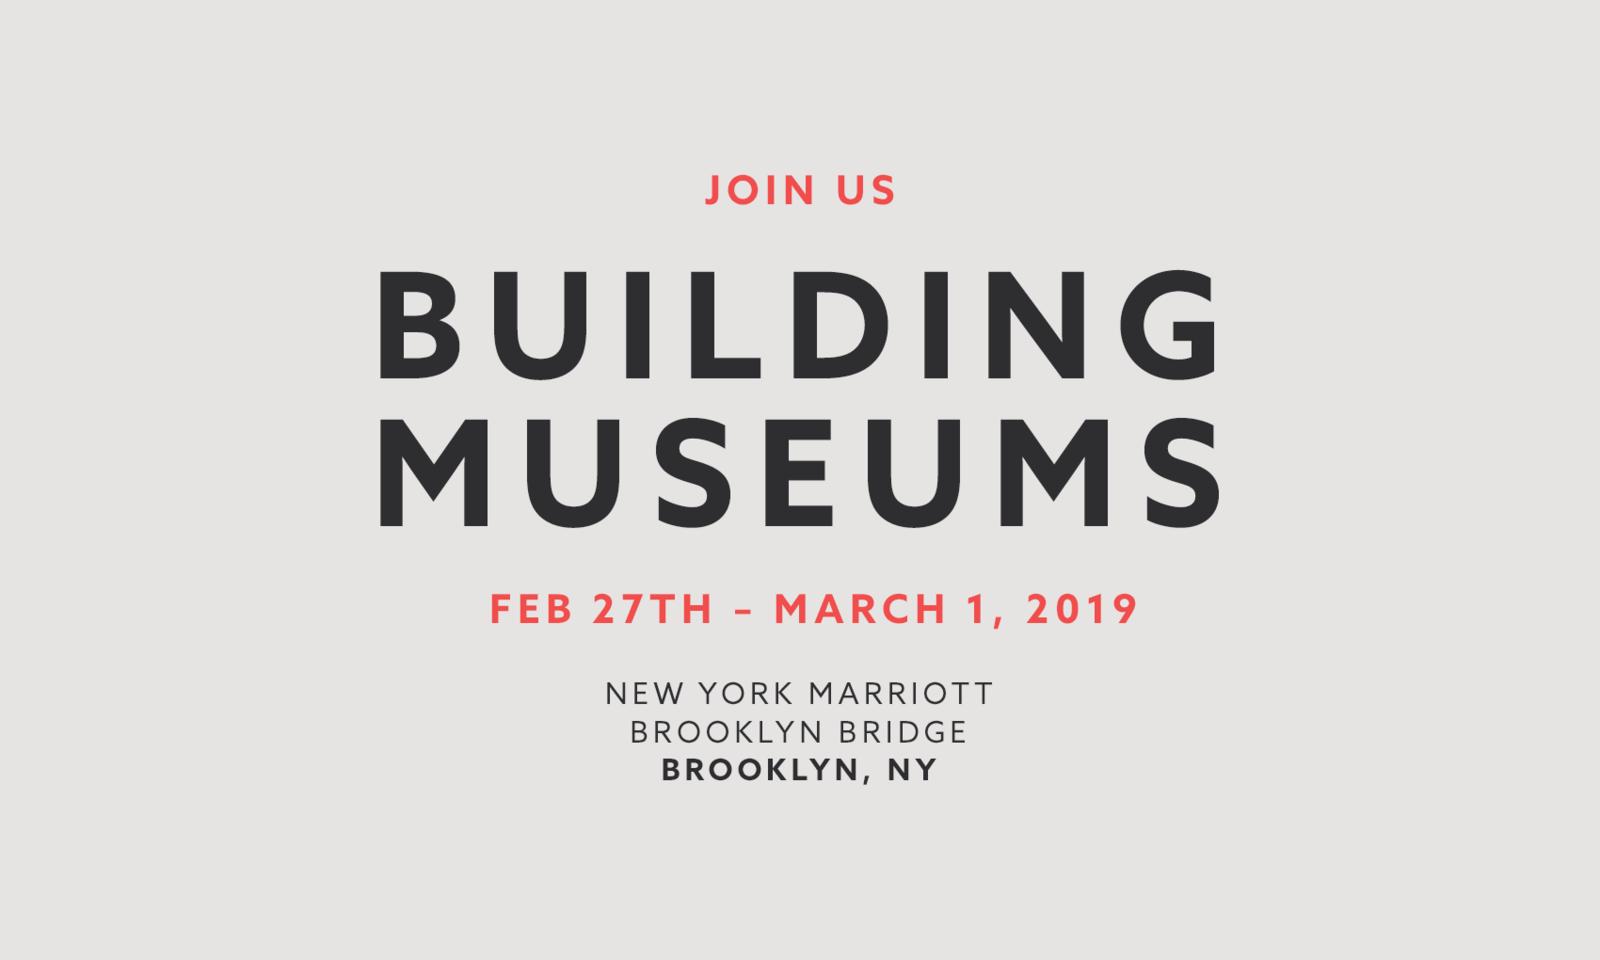 Building Museums 2019